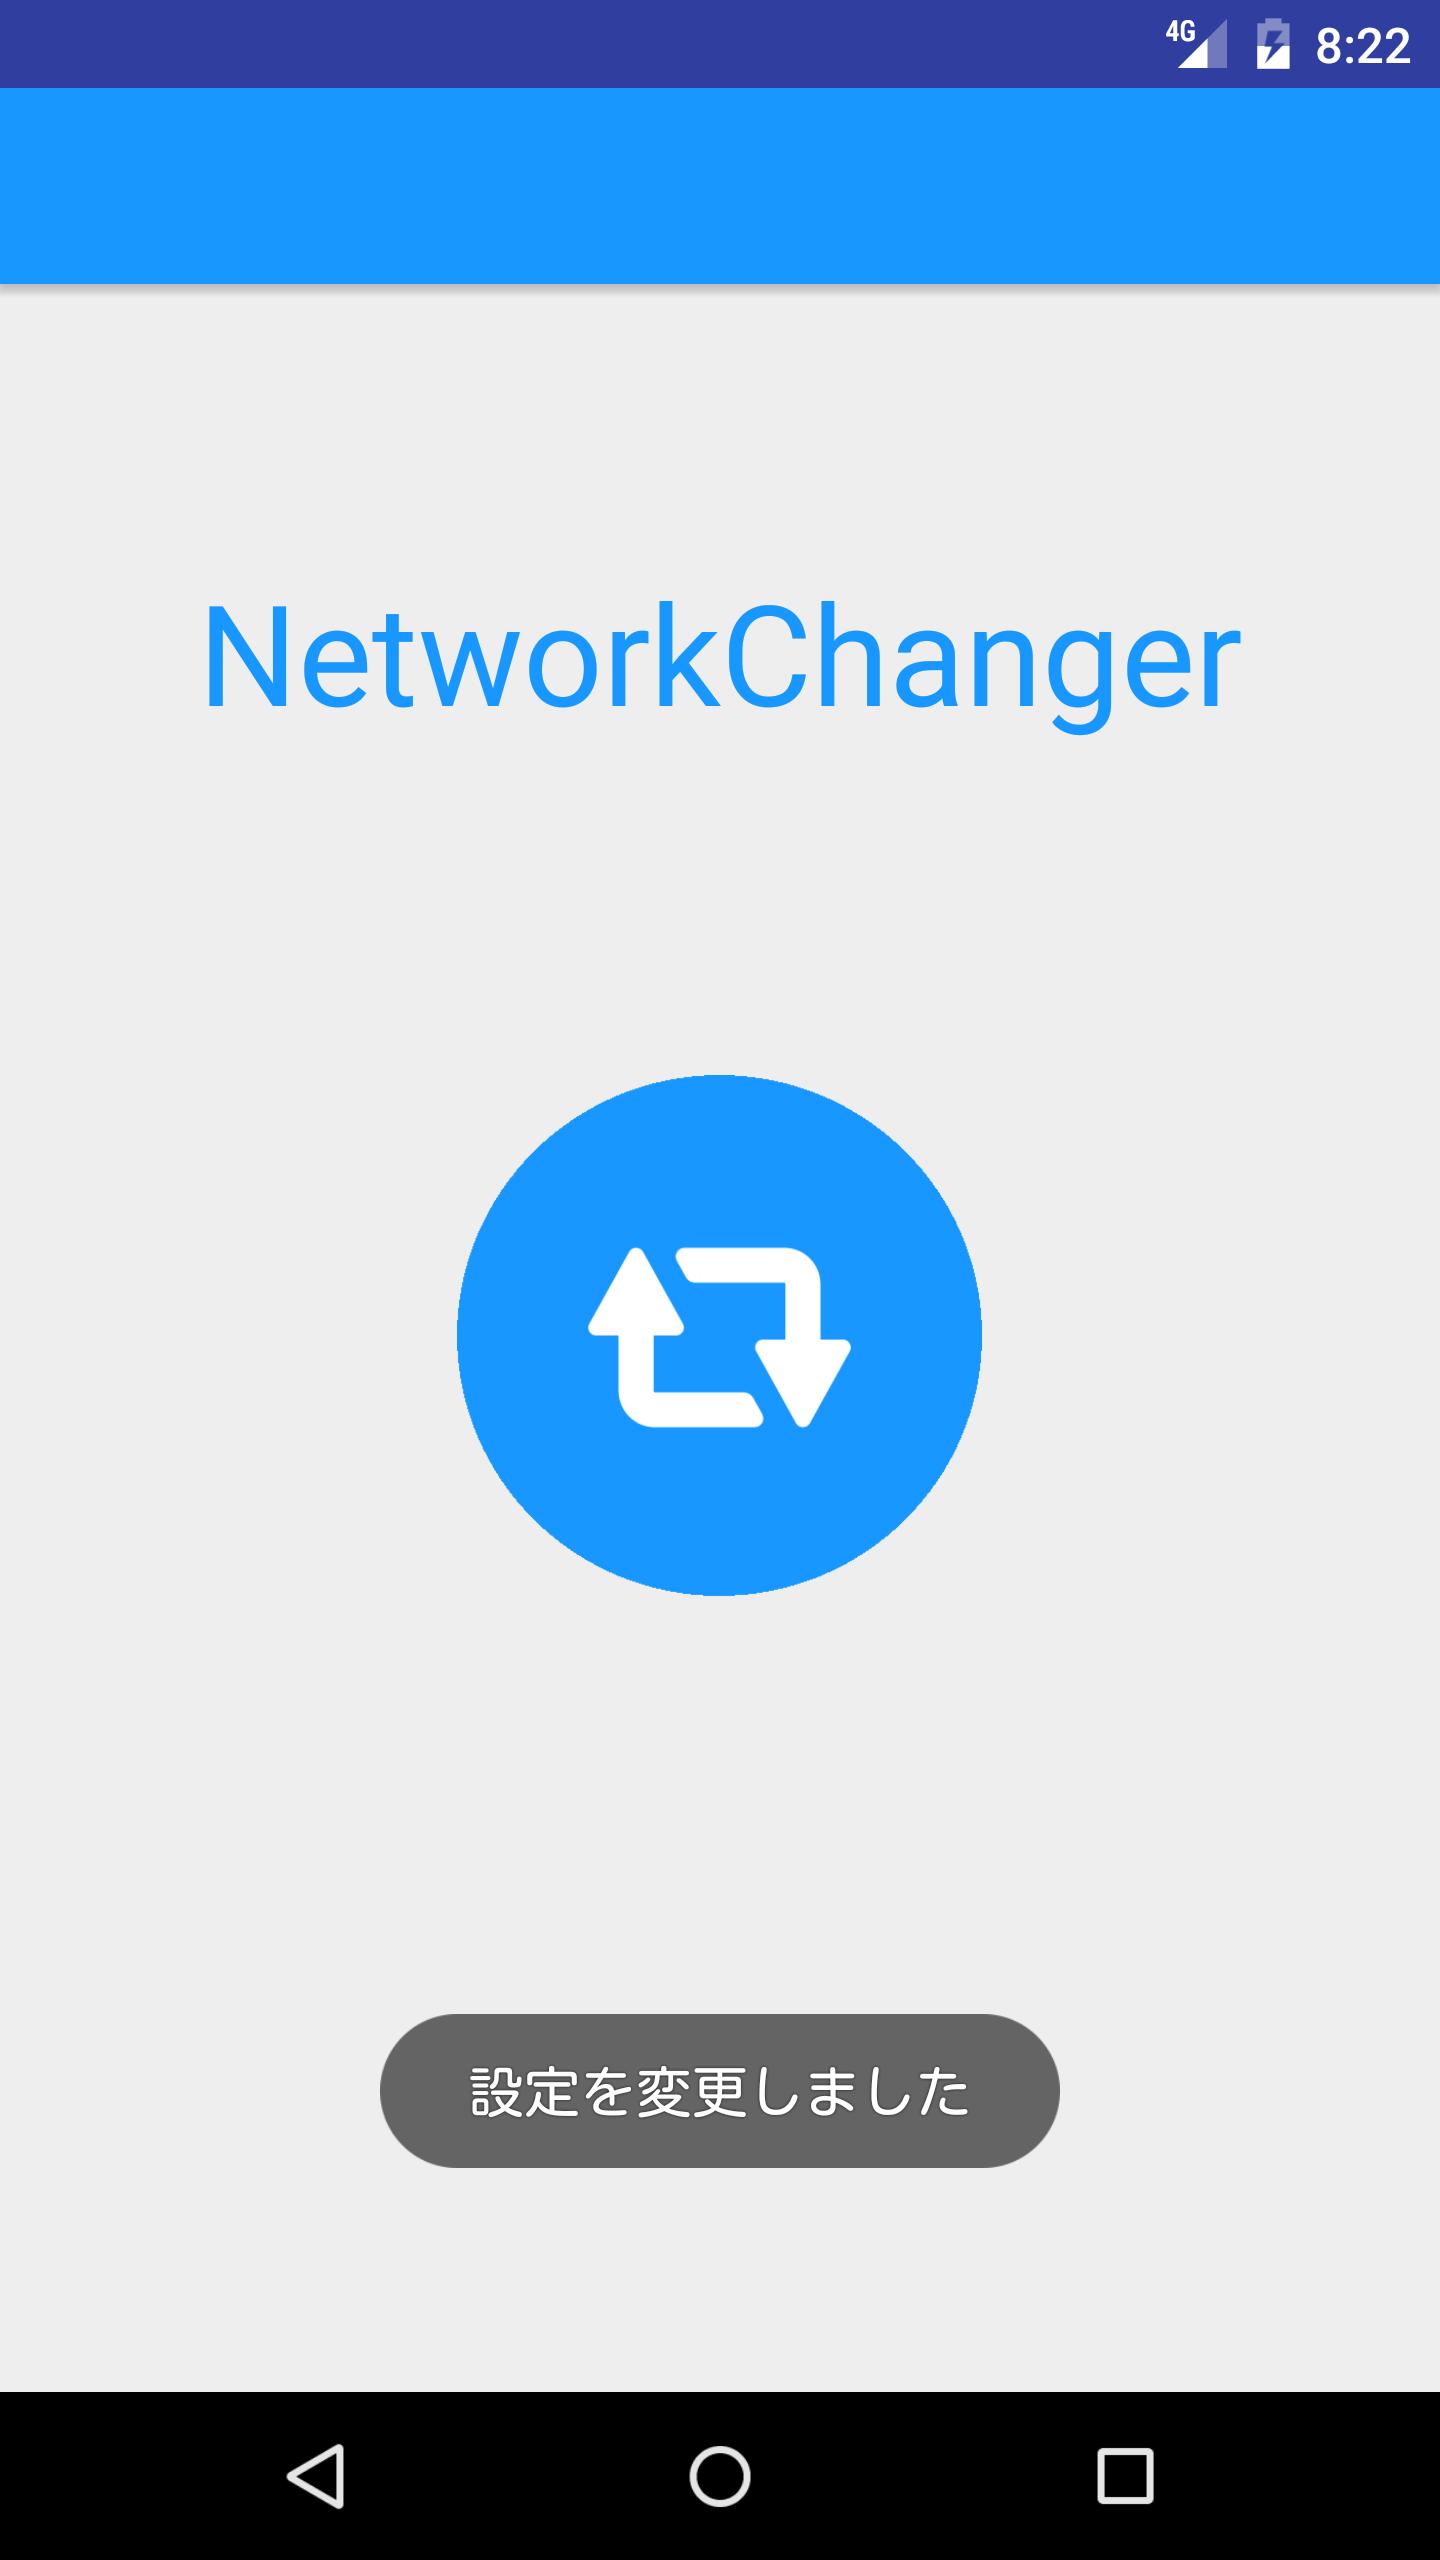 NetworkChanger_2.png